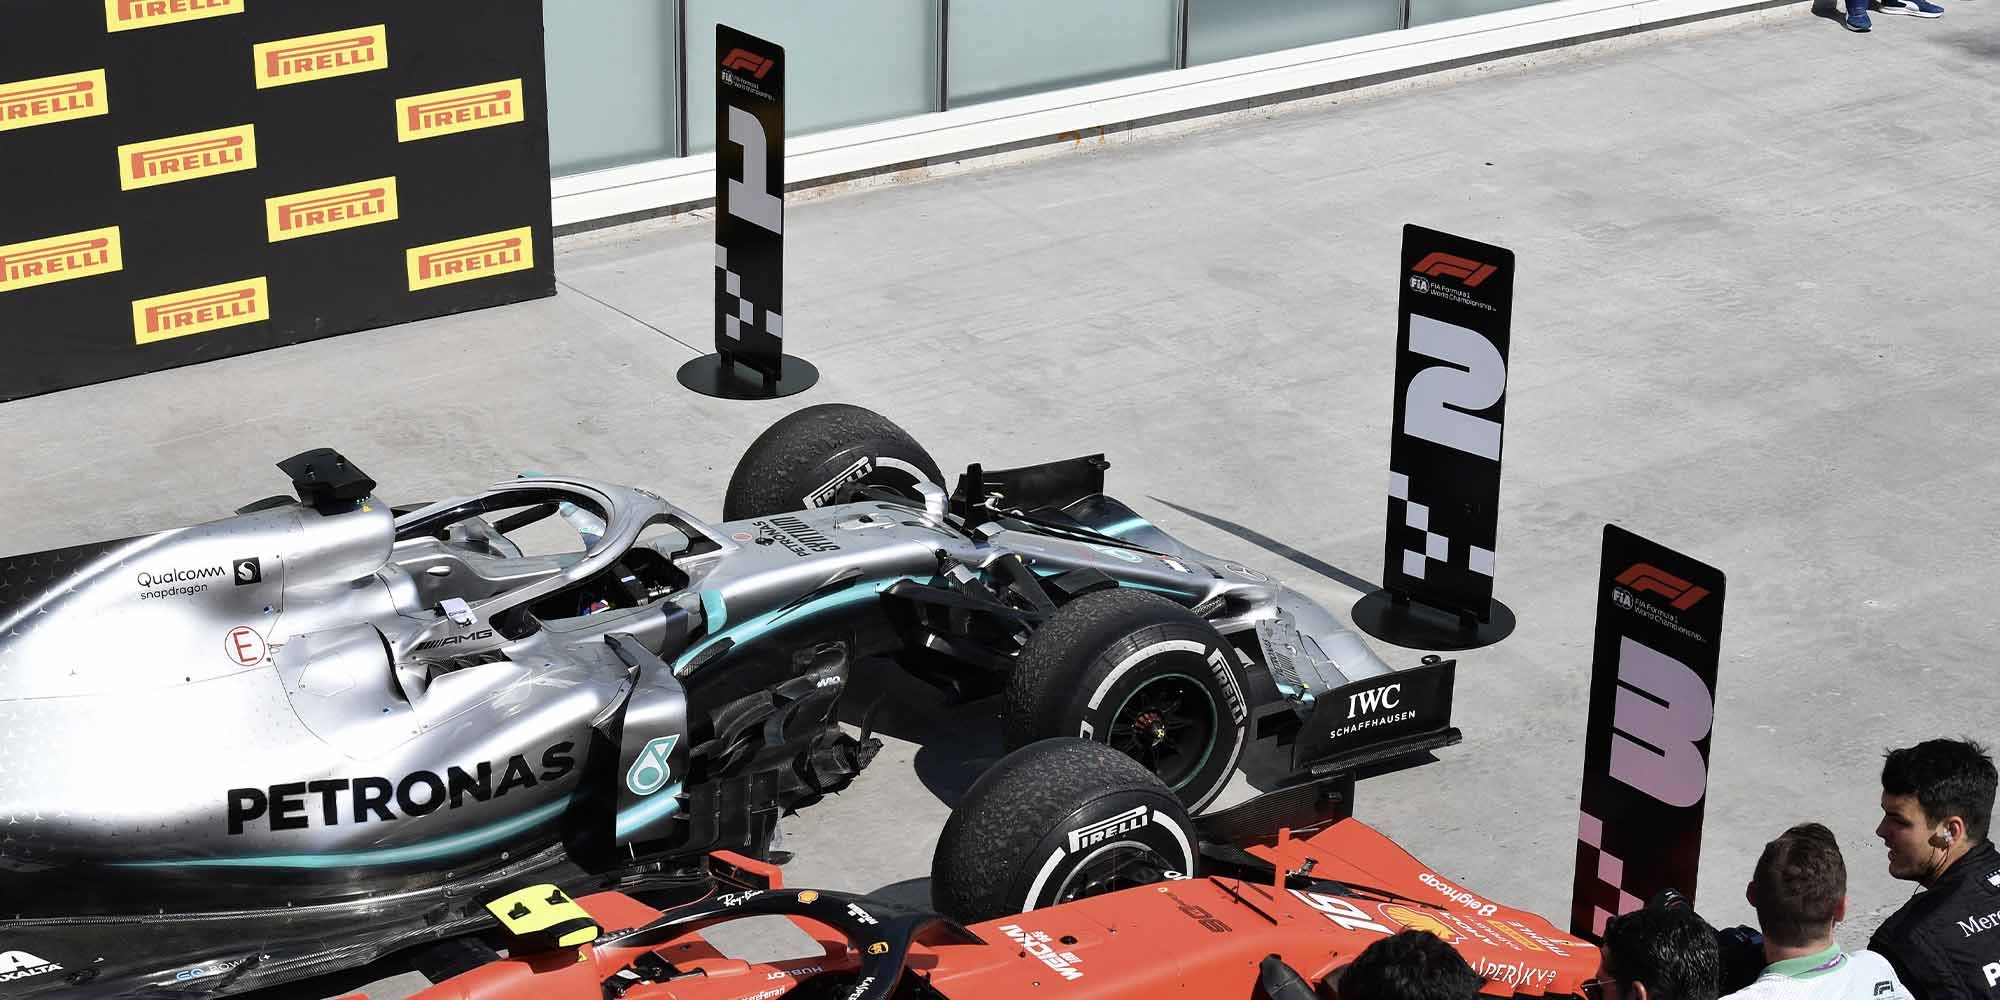 Best races of the 2019 F1 season: Canadian Grand Prix